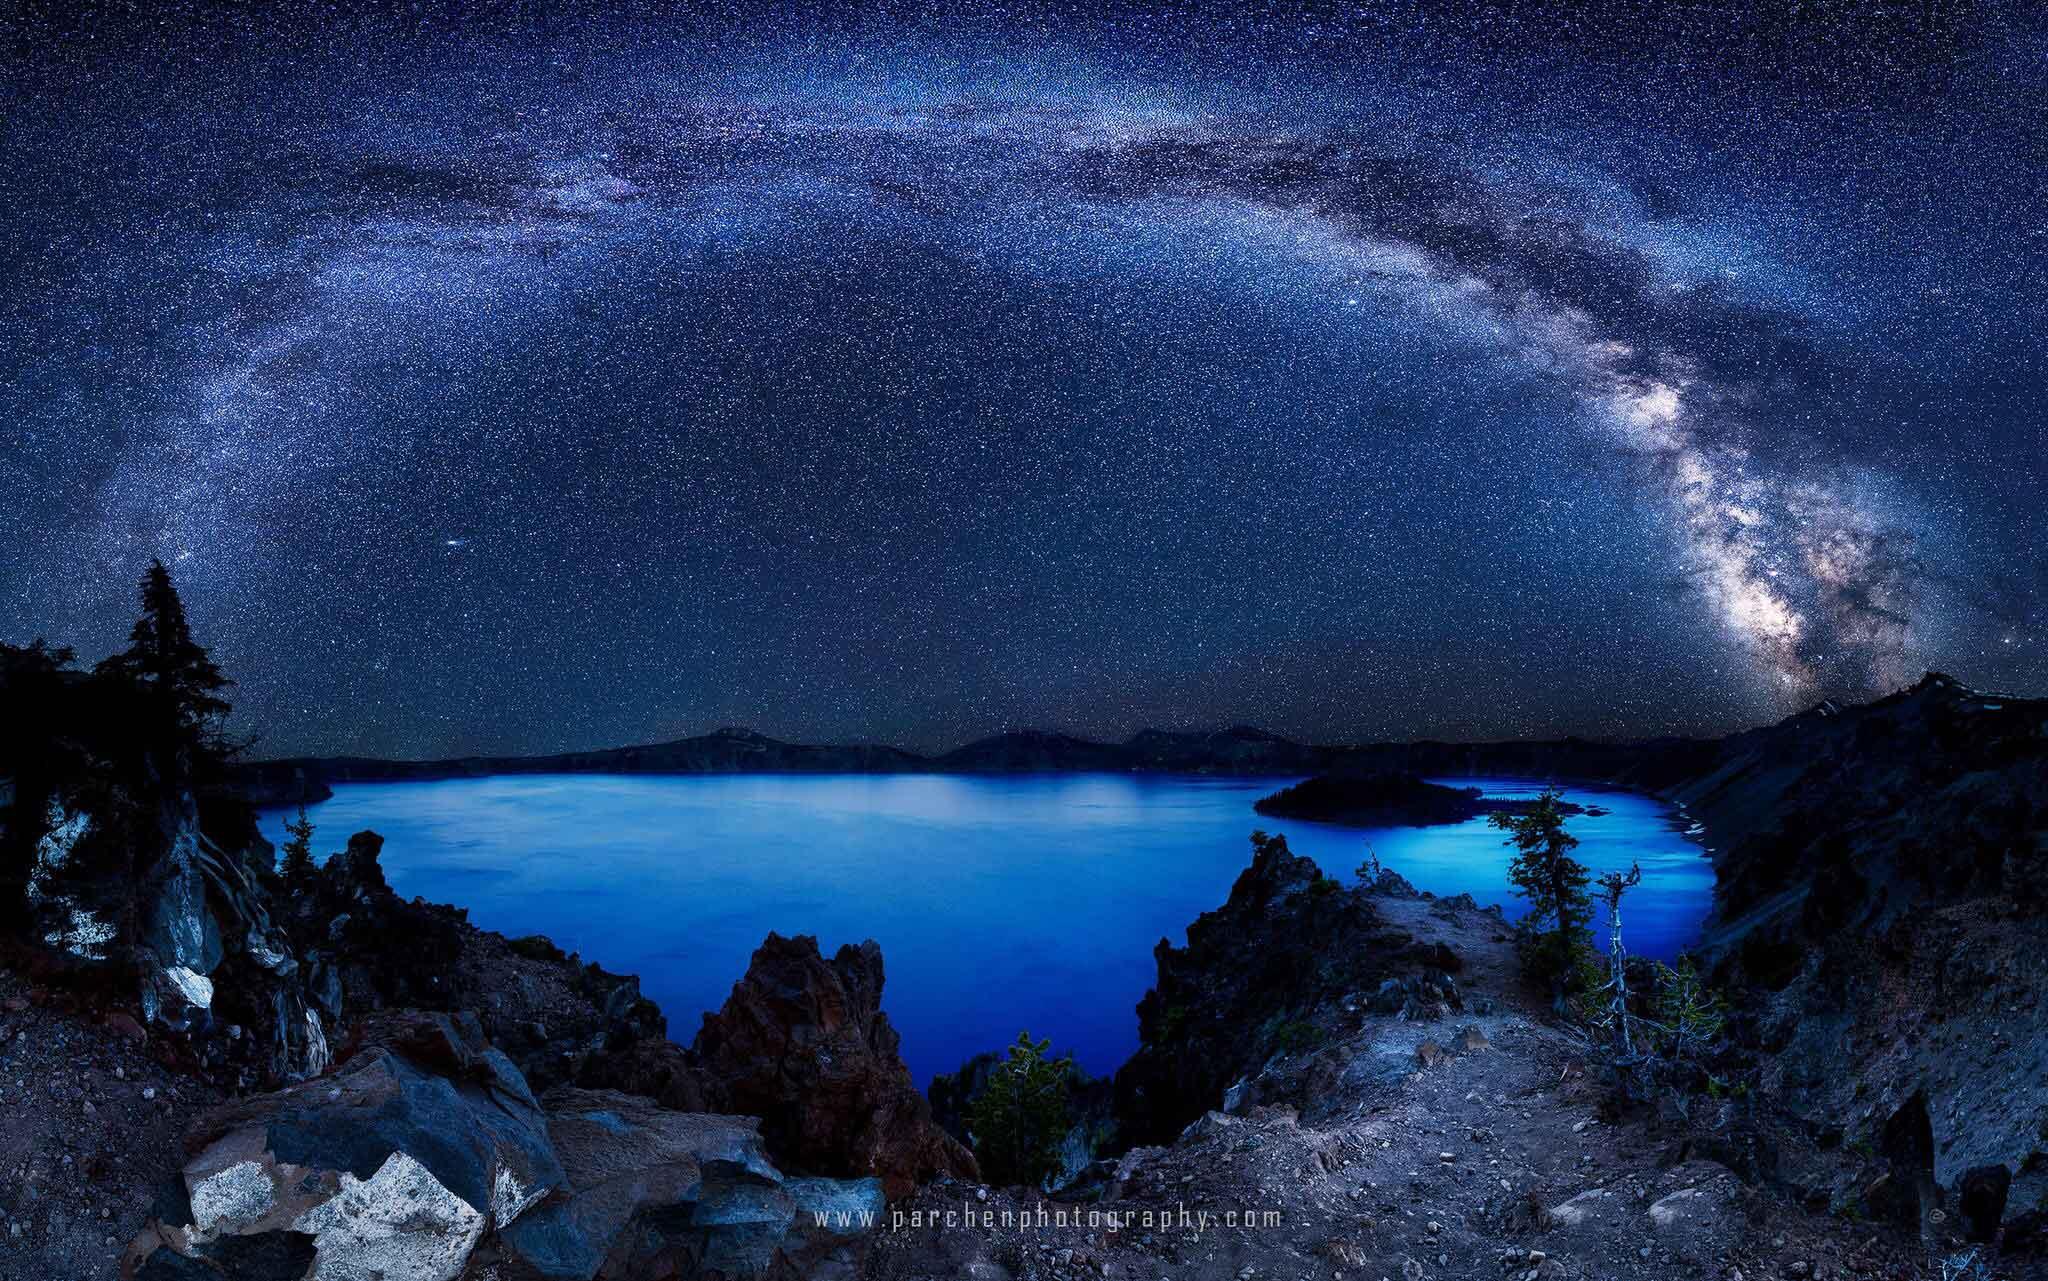 4-Crater-Lakes-In-America-Mazama-lake-in-Oregon,-United-States